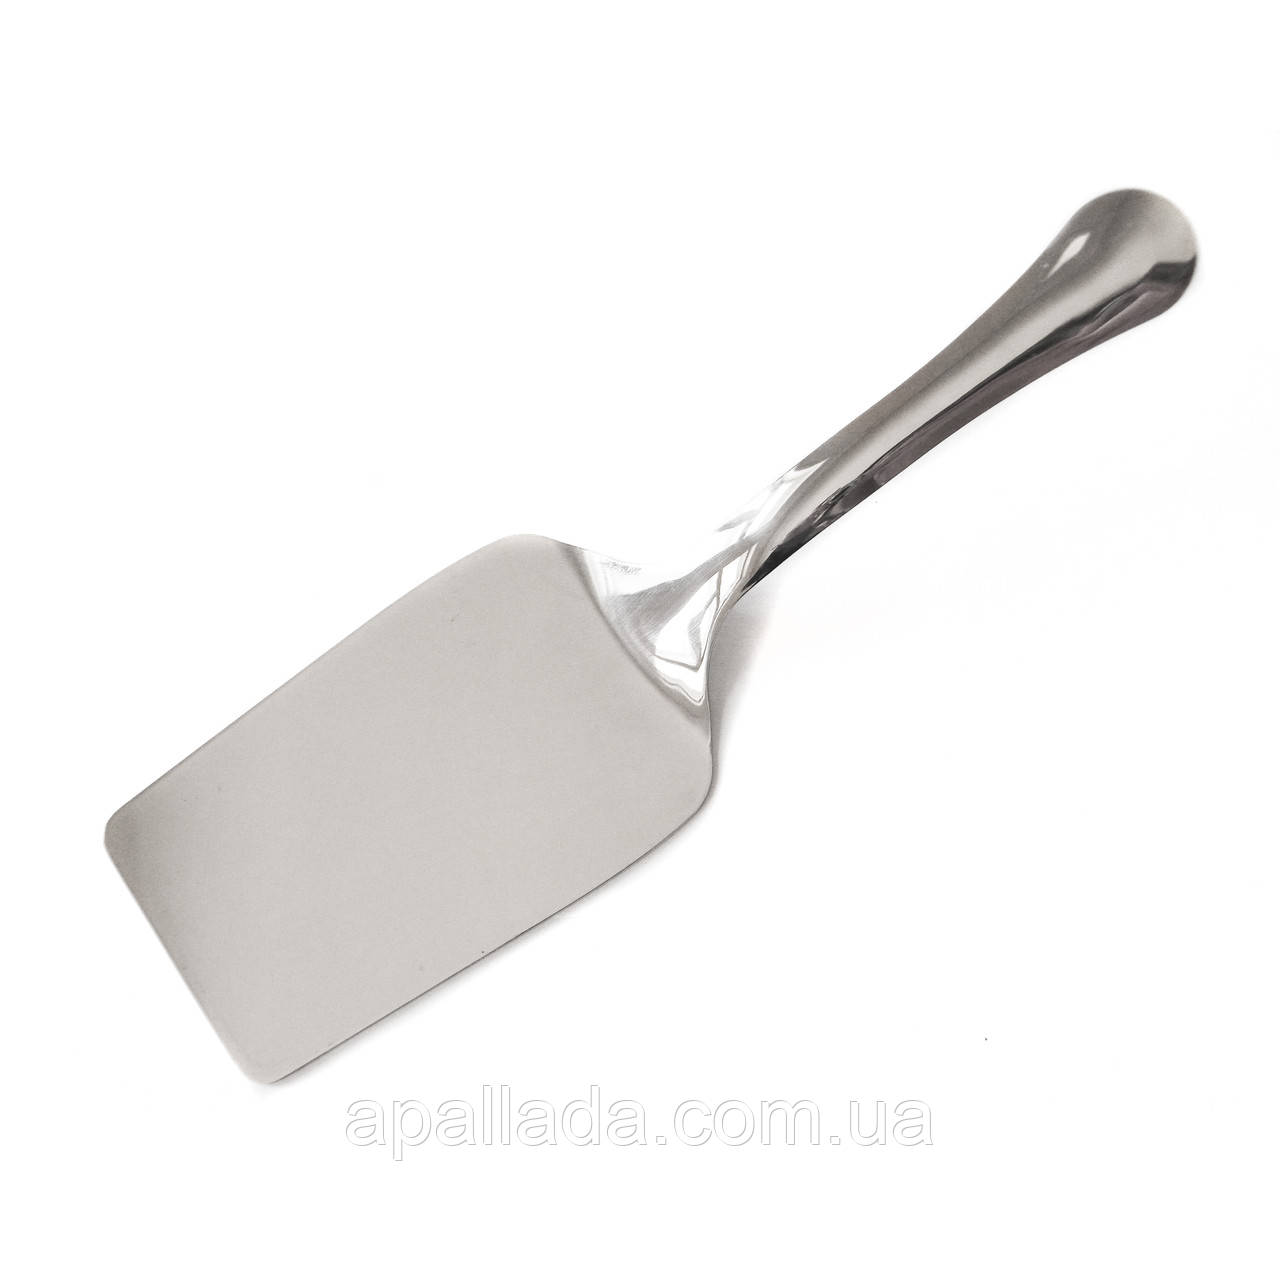 Лопатка для лазаньи Boston, 18/10 нержавеющая сталь, 25см.